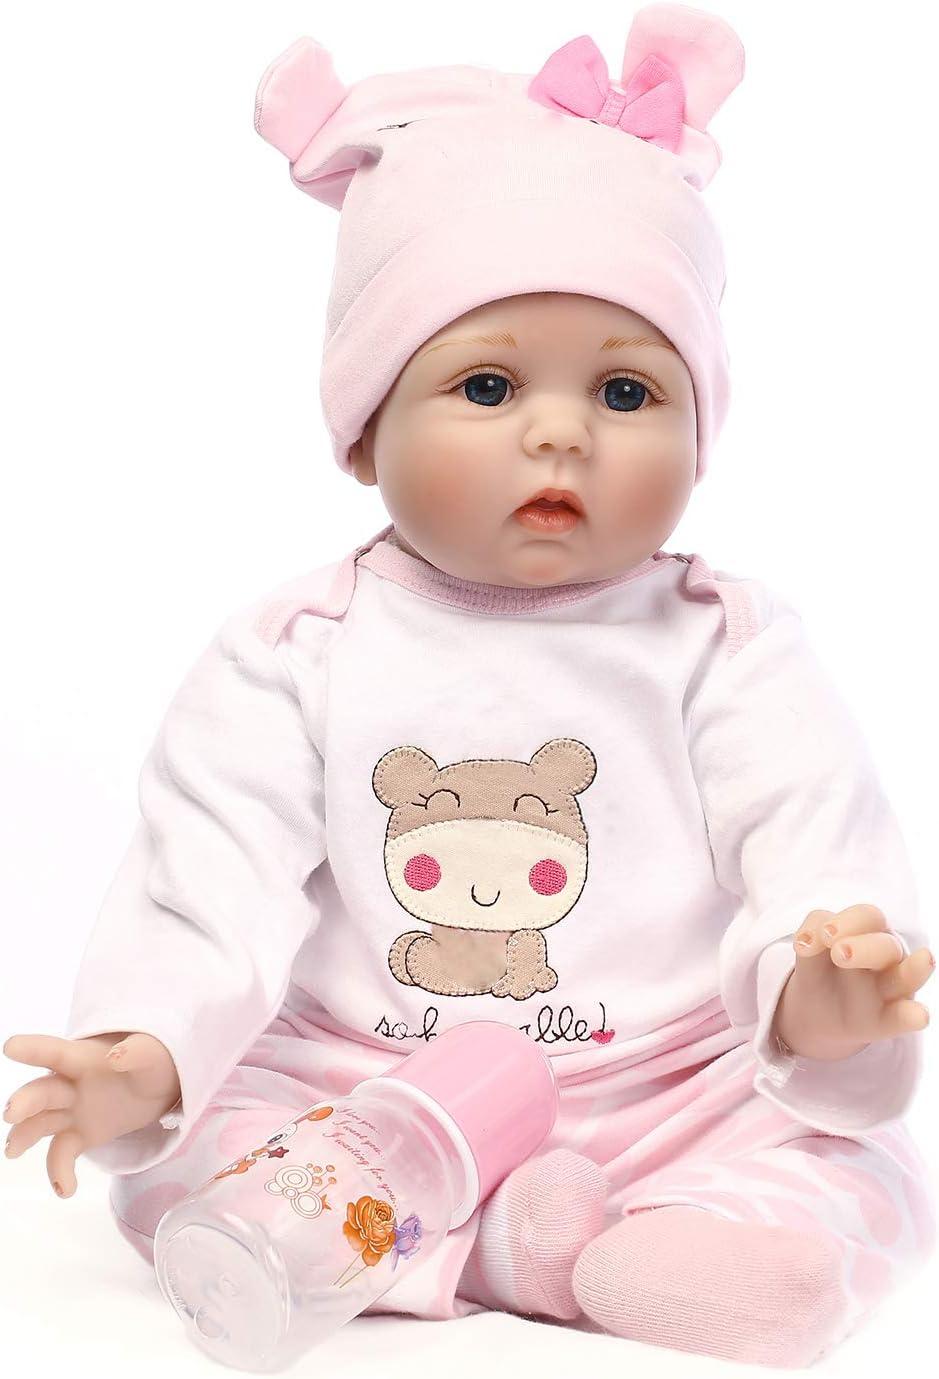 22inch Reborn Baby Doll Girl Look Real Newborn Soft Silicone Vinyl Baby Dolls